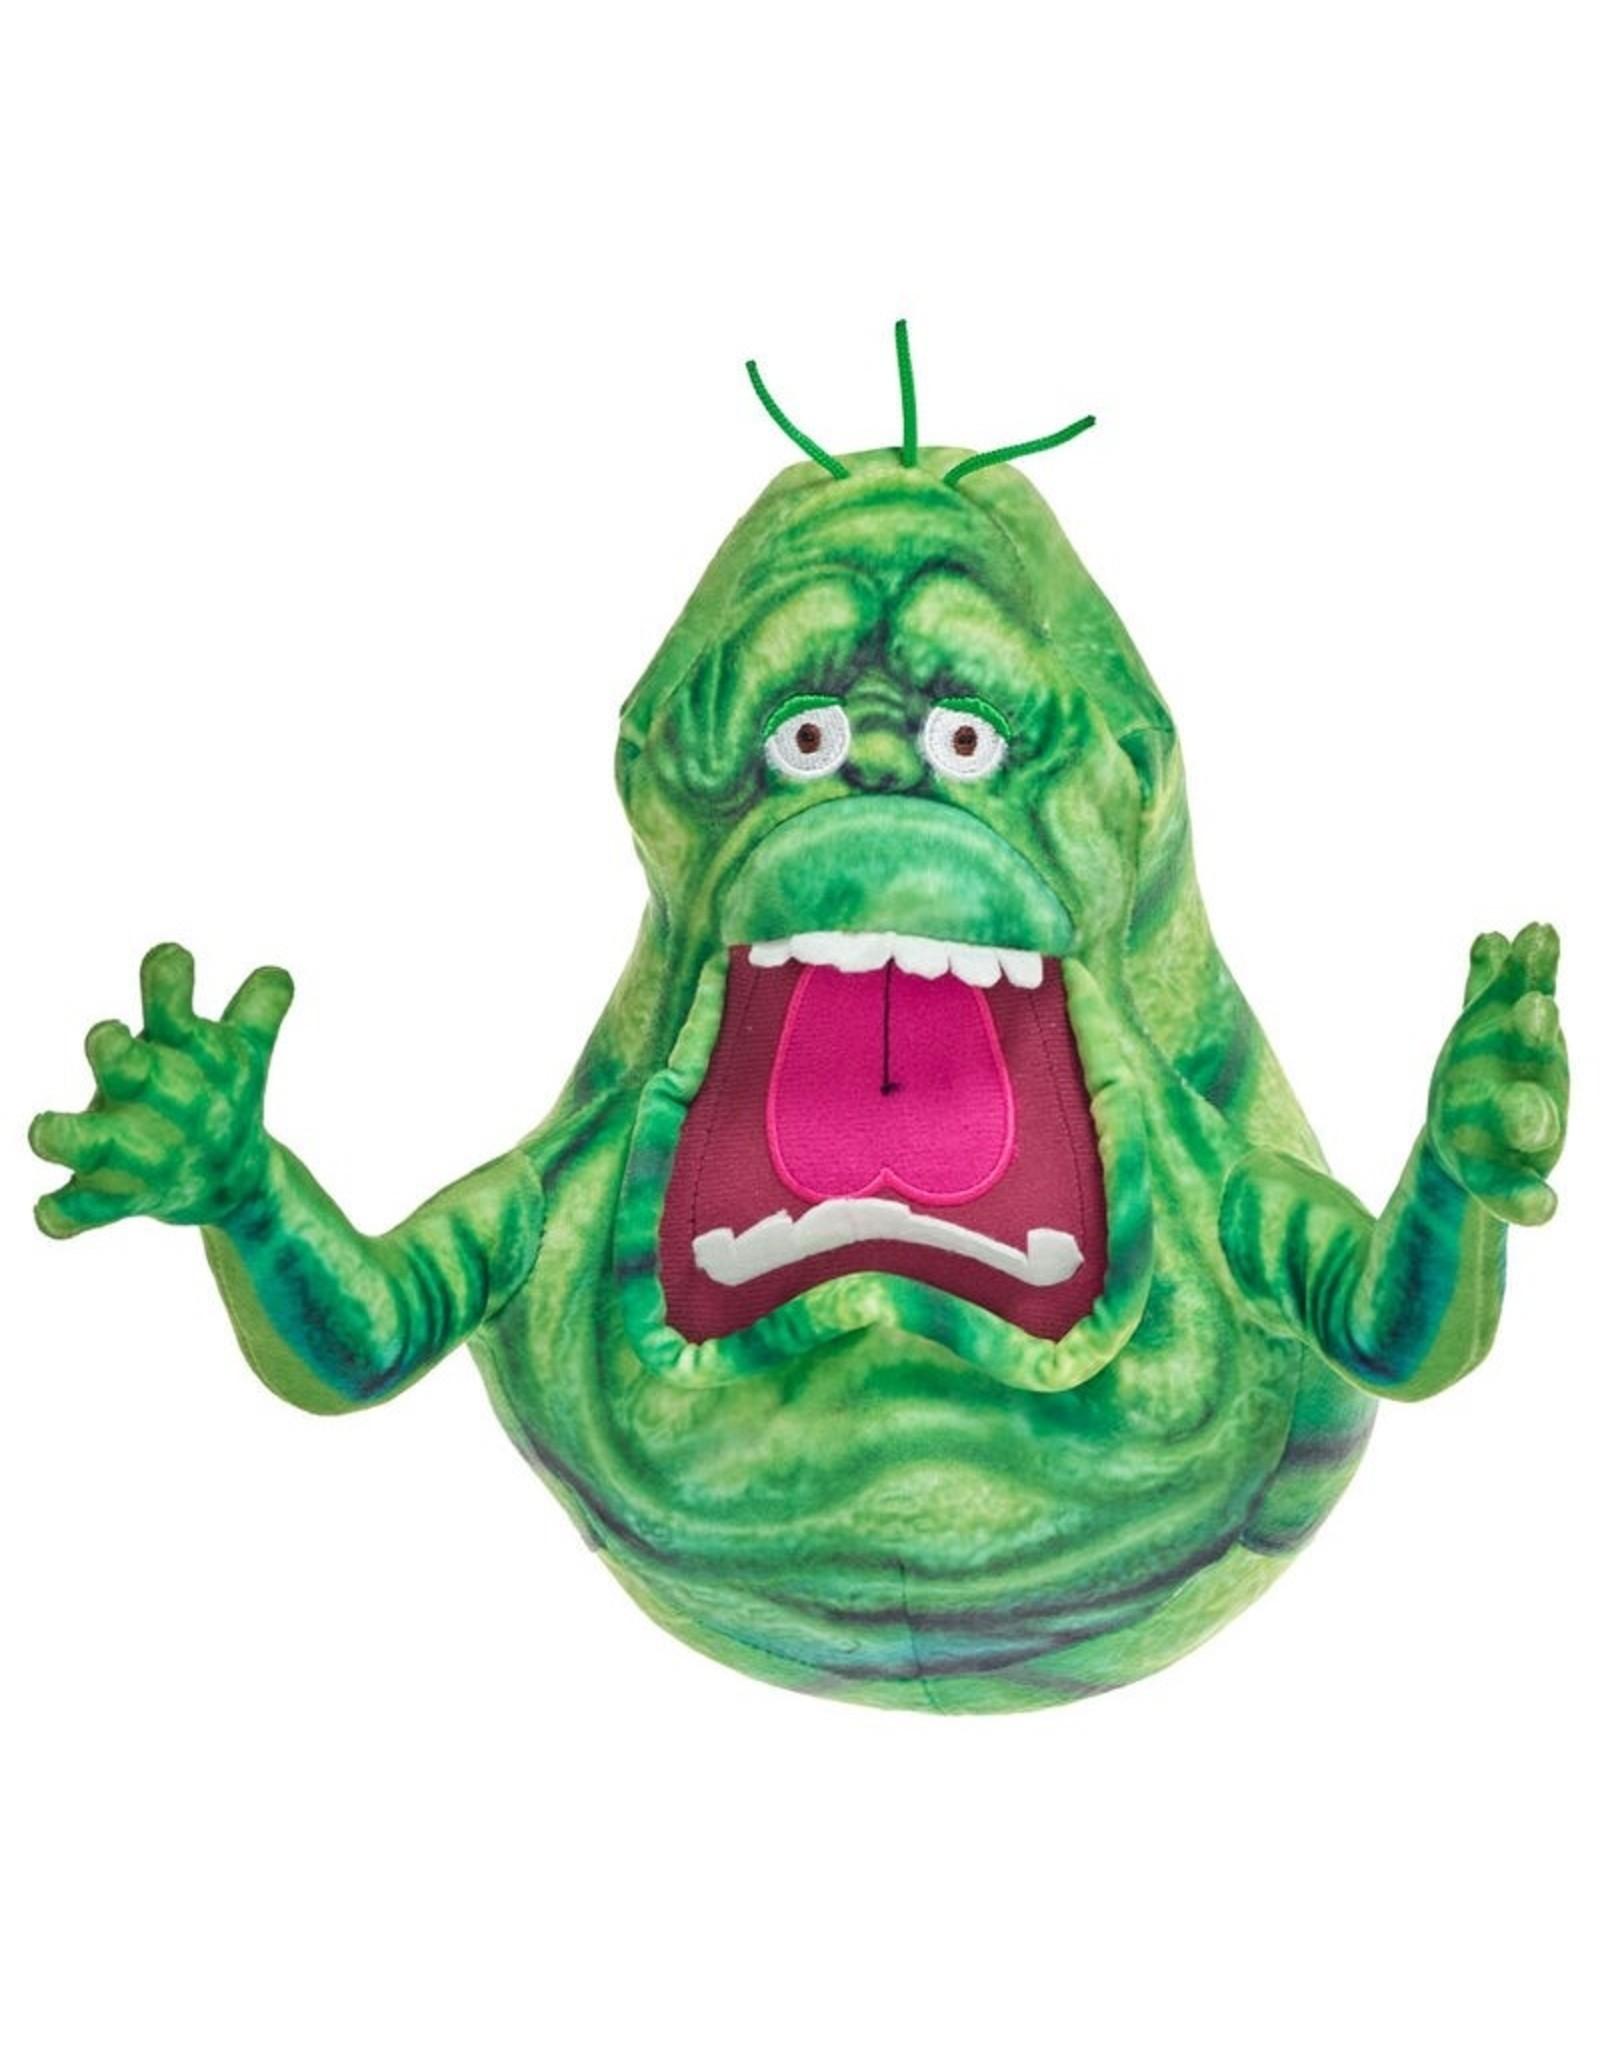 ghostbusters Merchandise pluche en figuren - Ghostbusters Slimer pluche 24cm